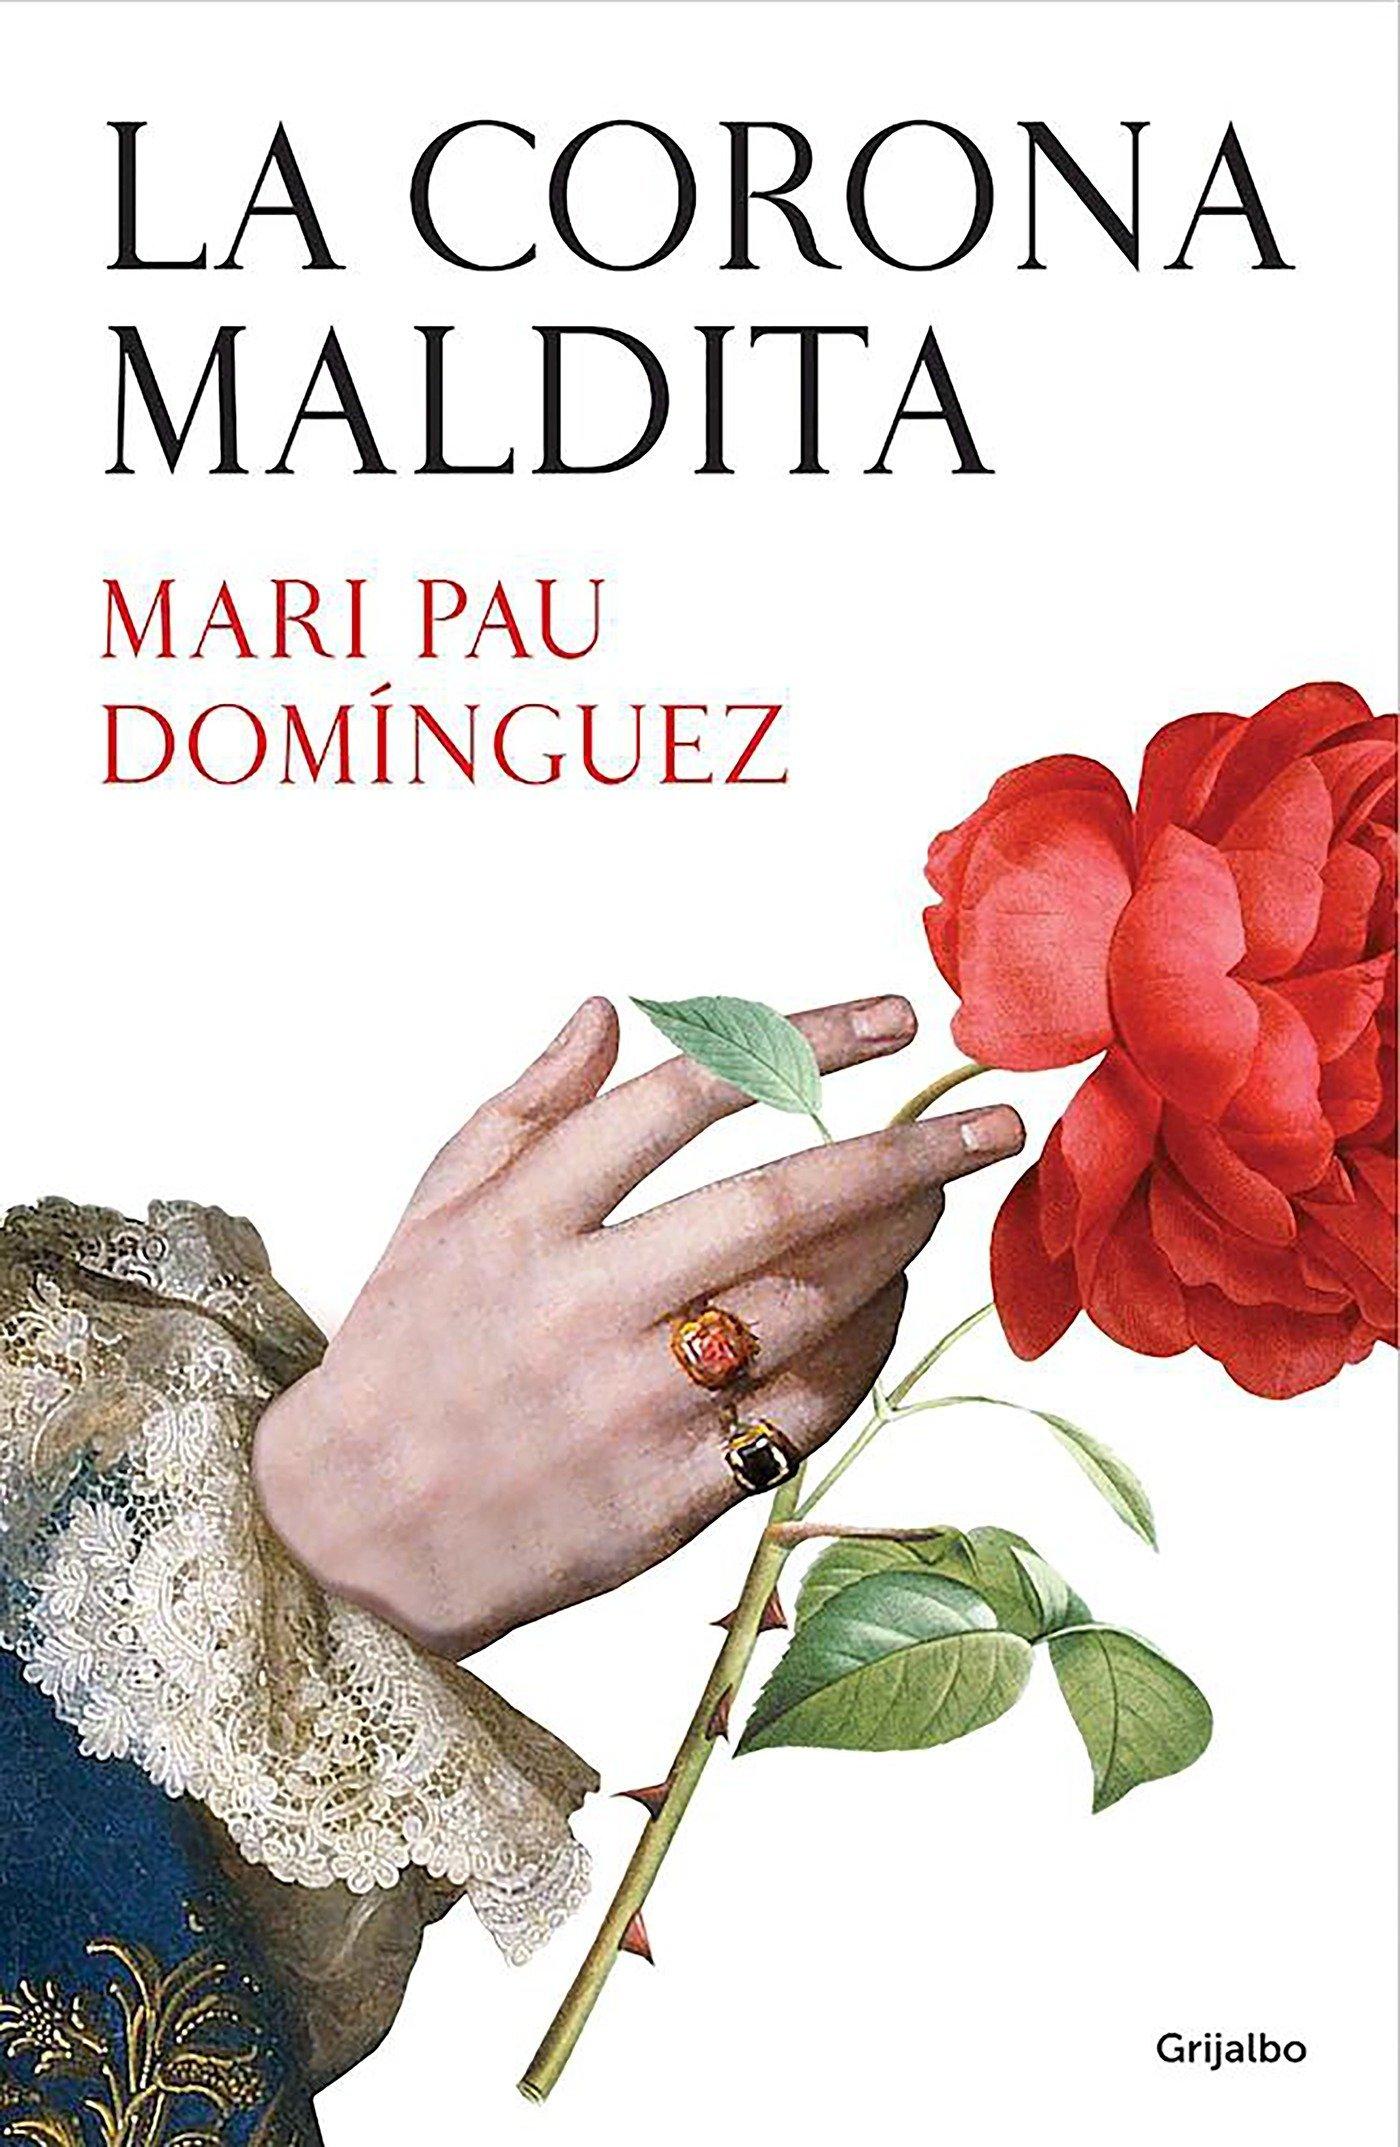 La corona maldita (Novela histórica): Amazon.es: Domínguez, Mari Pau: Libros